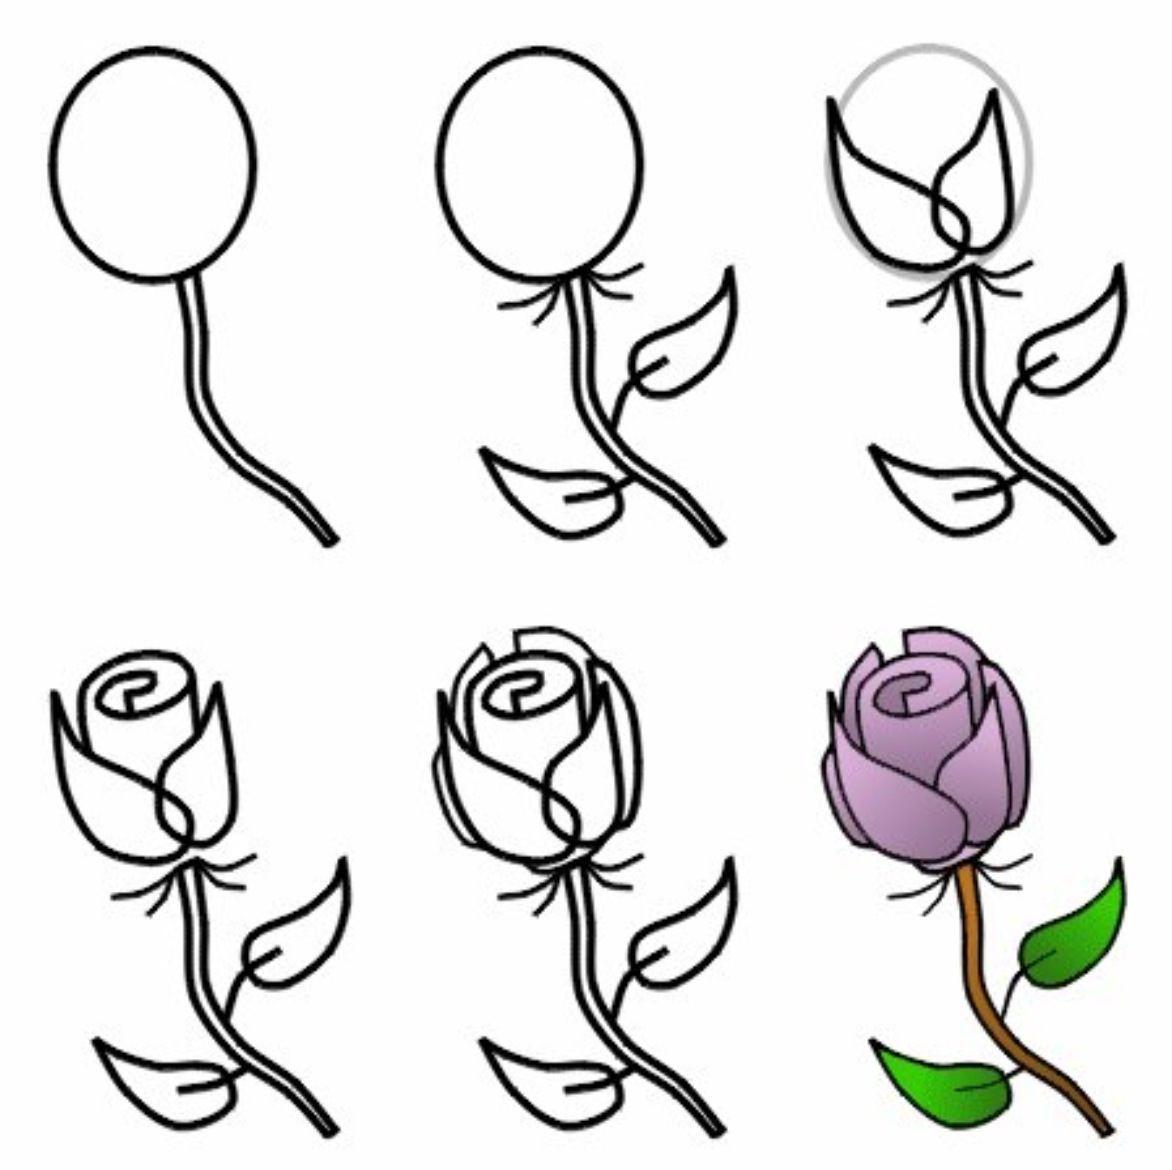 1172x1170 How To Draw A Flower How To Draw A Flower Step